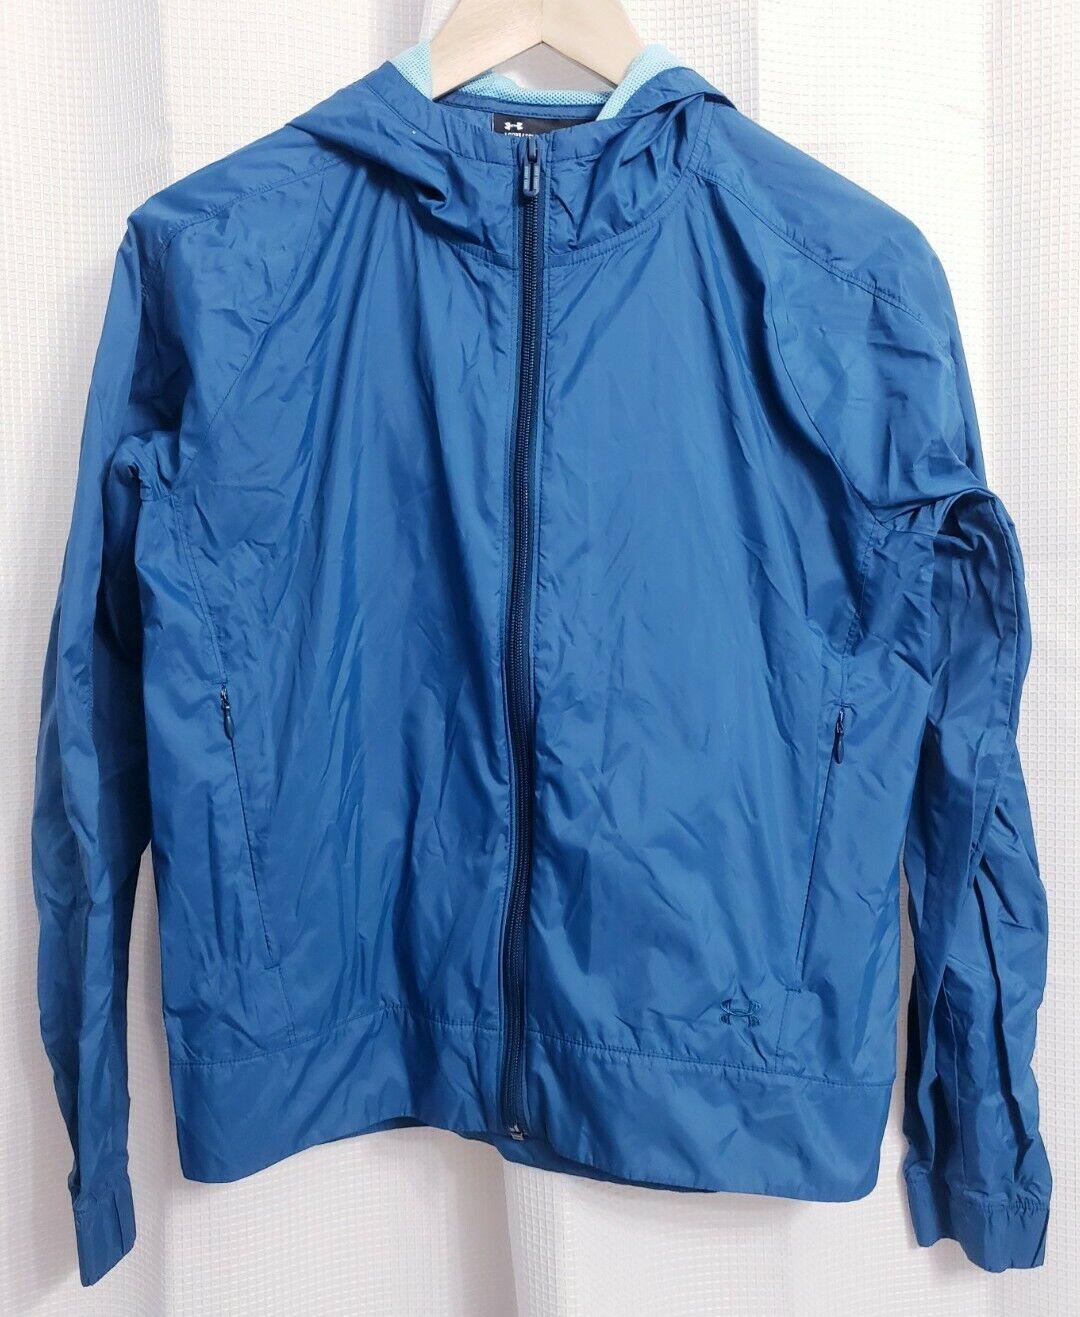 Under Armour Turquoise Lightweight Nylon Jacket Women's size XS